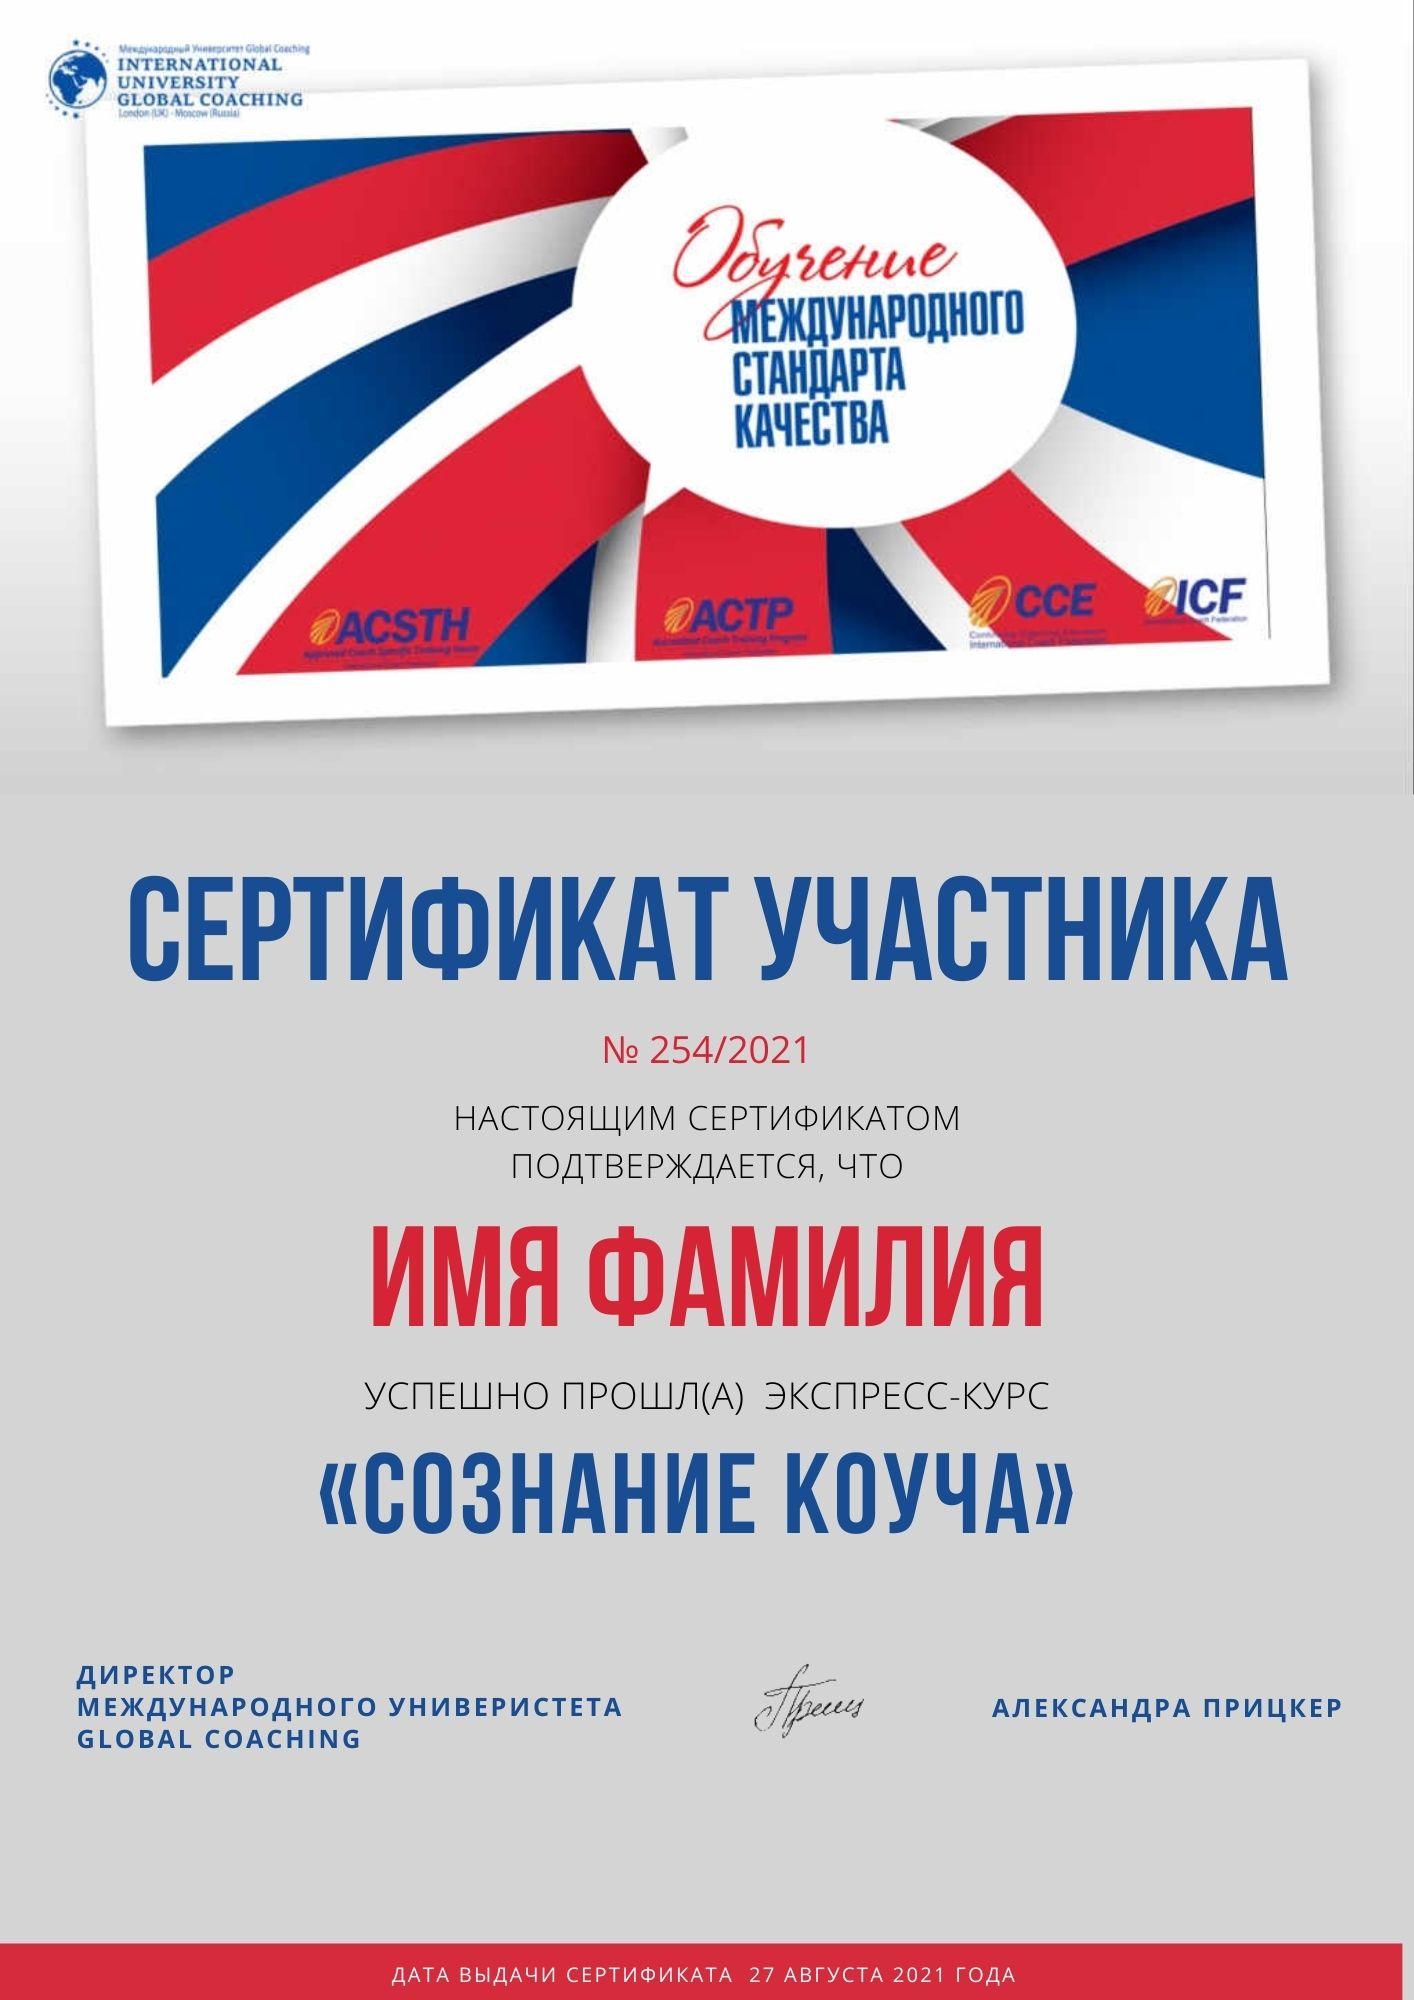 Сертификат участника (1)